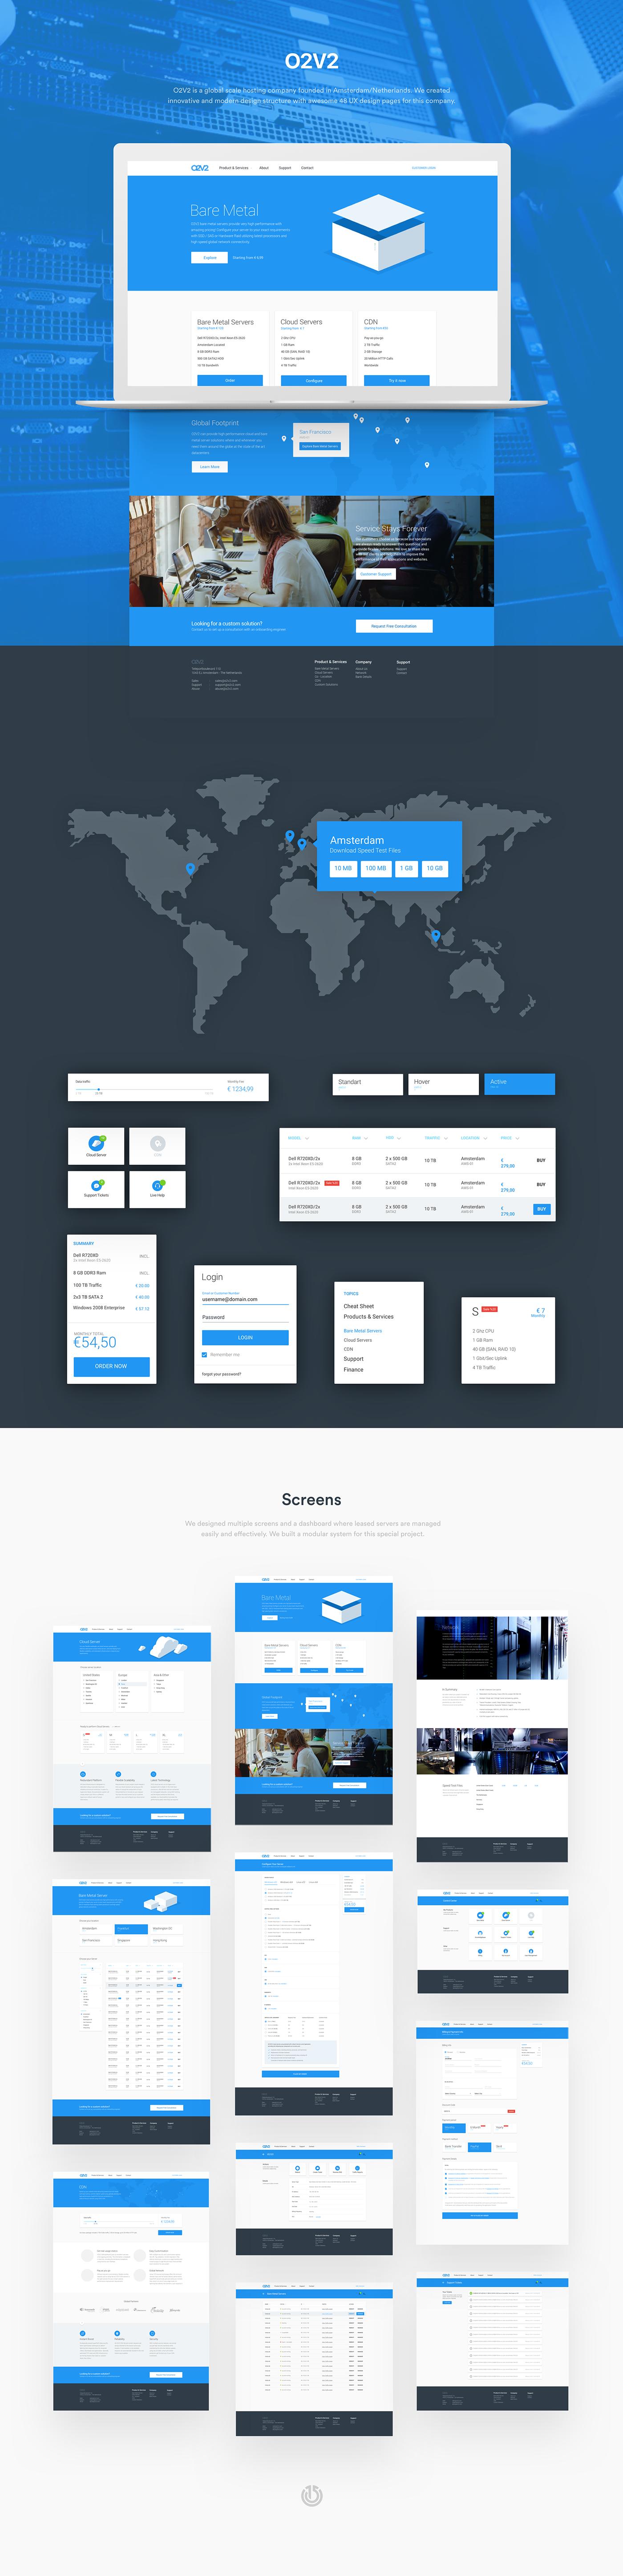 cloud,hosting,UI,ux,dashboard,material design,listing,checkout,cart,server